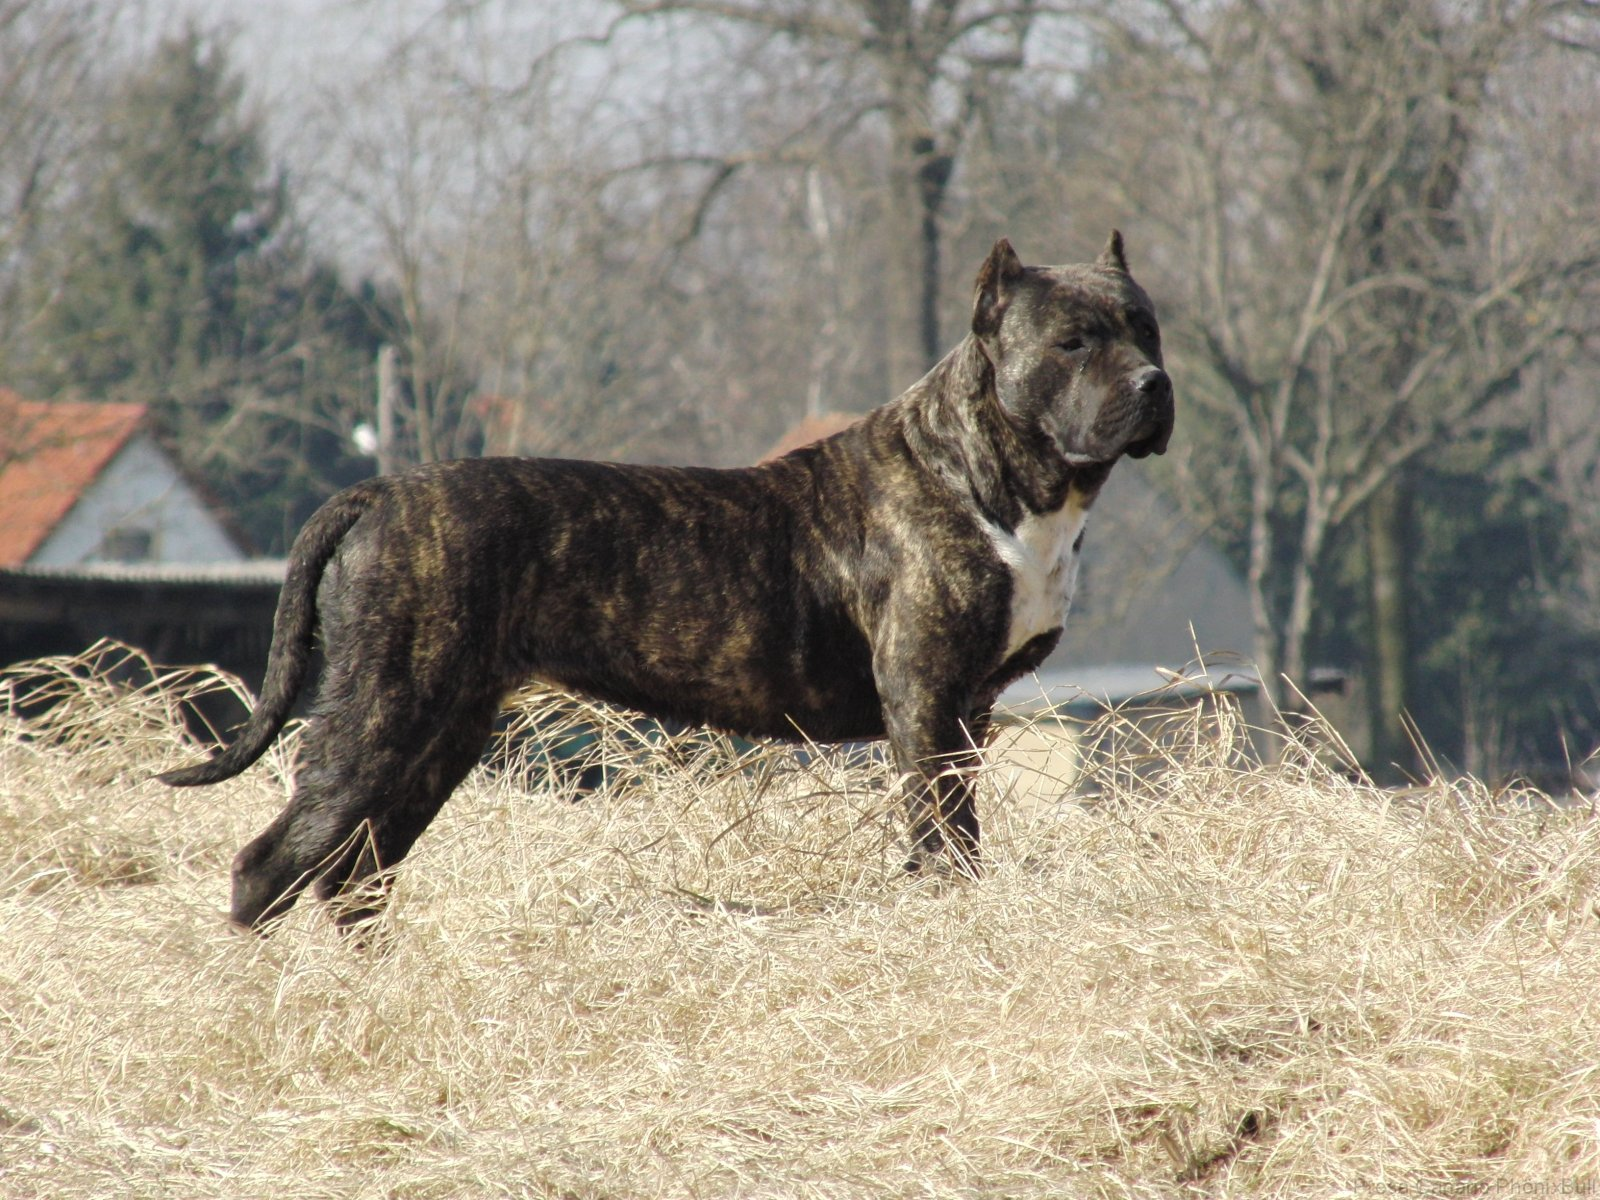 Dogo-Canario